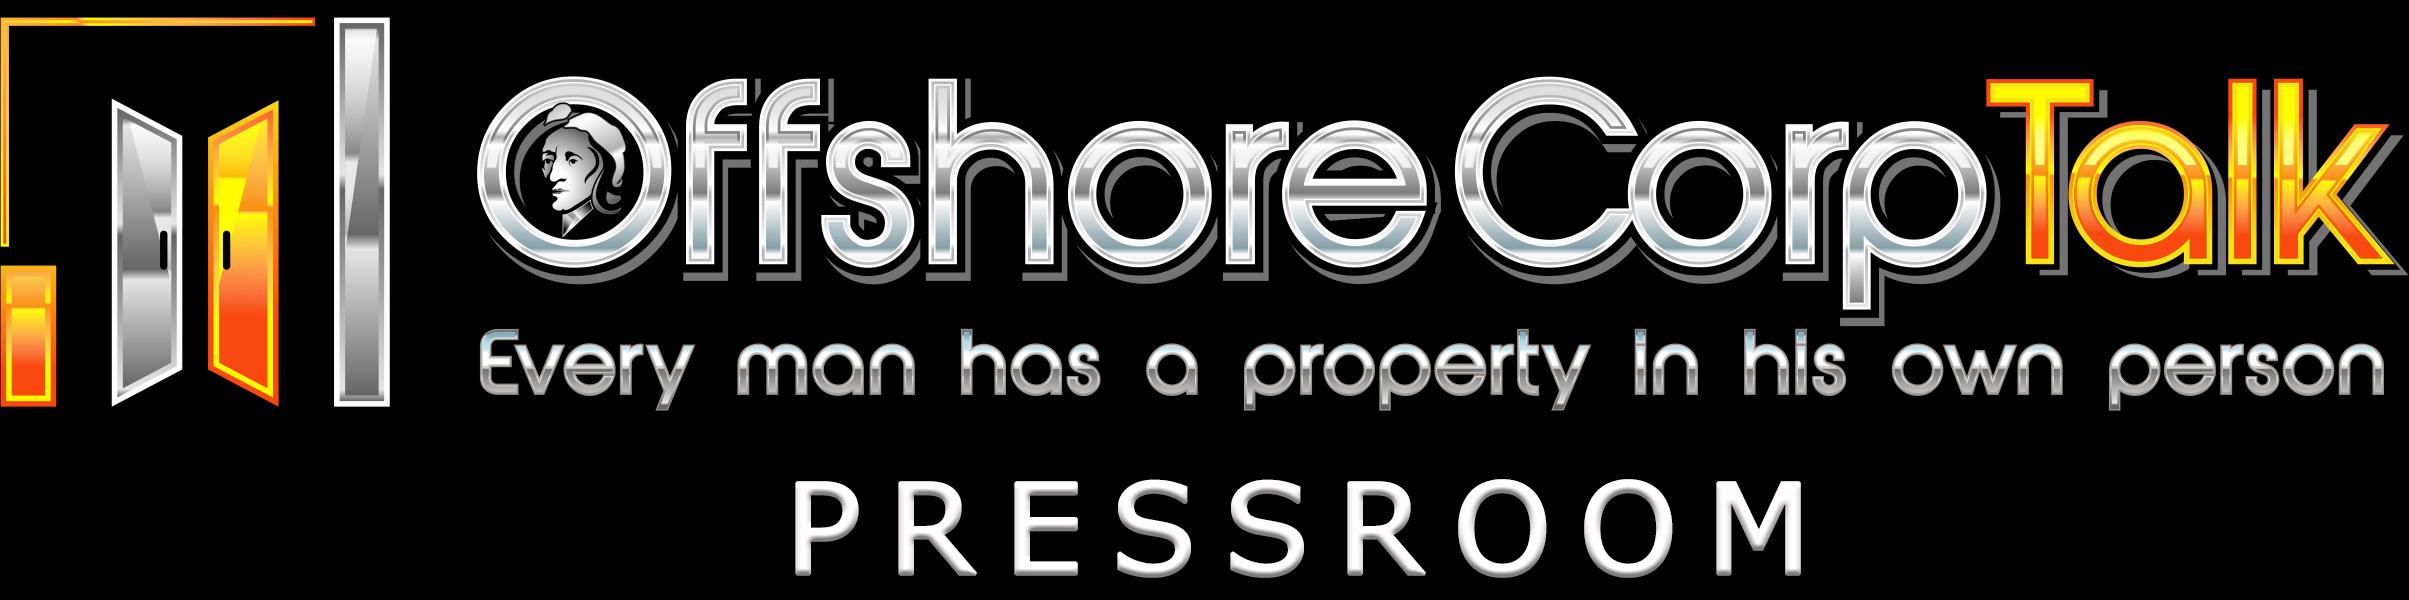 OffshoreCorpTalk-Pressroom.jpg